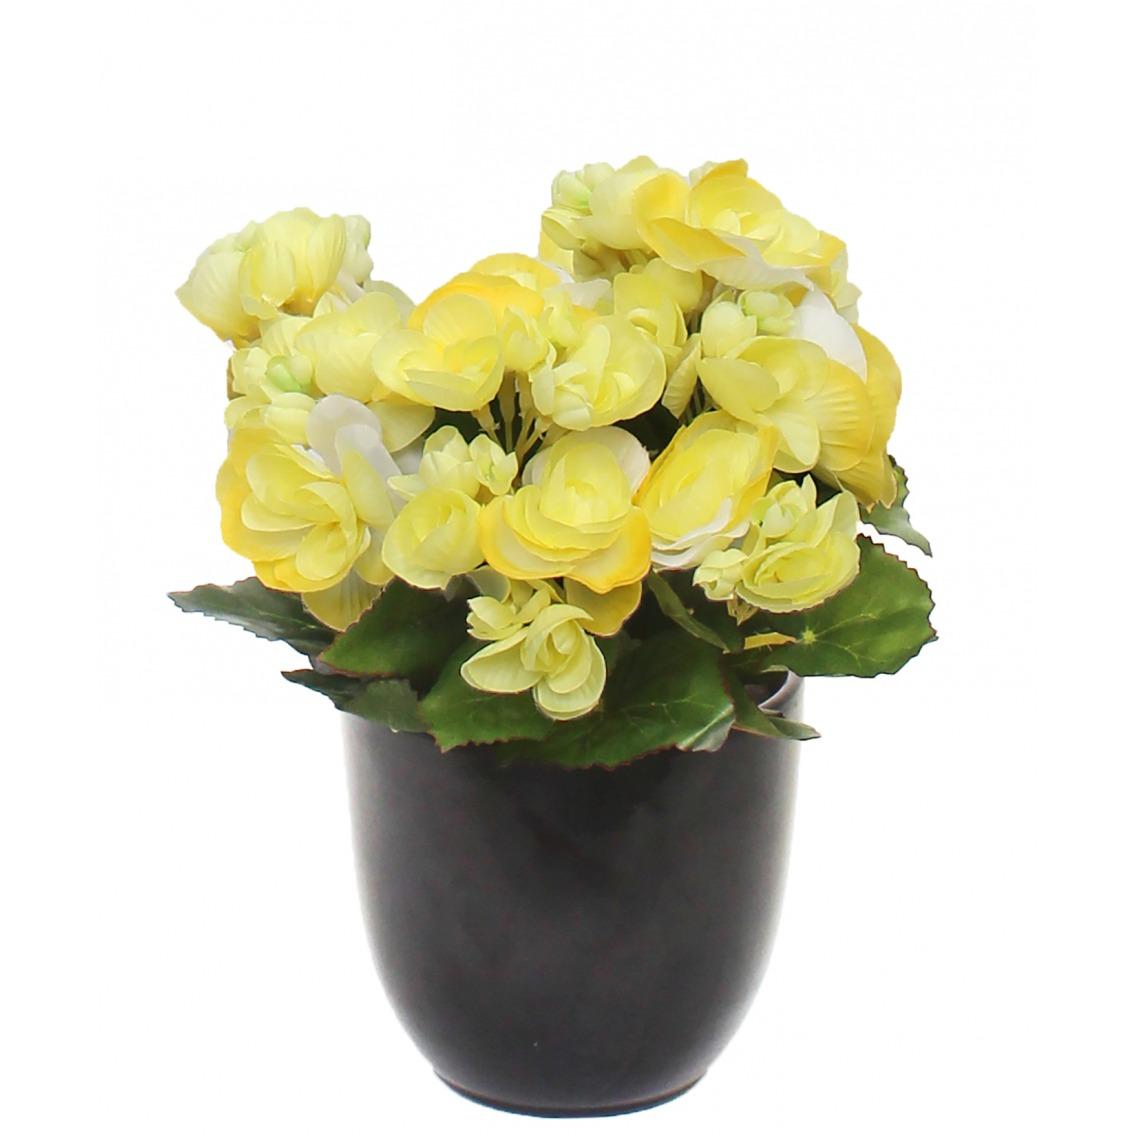 Branche de gardénia artificielle jaune pâle